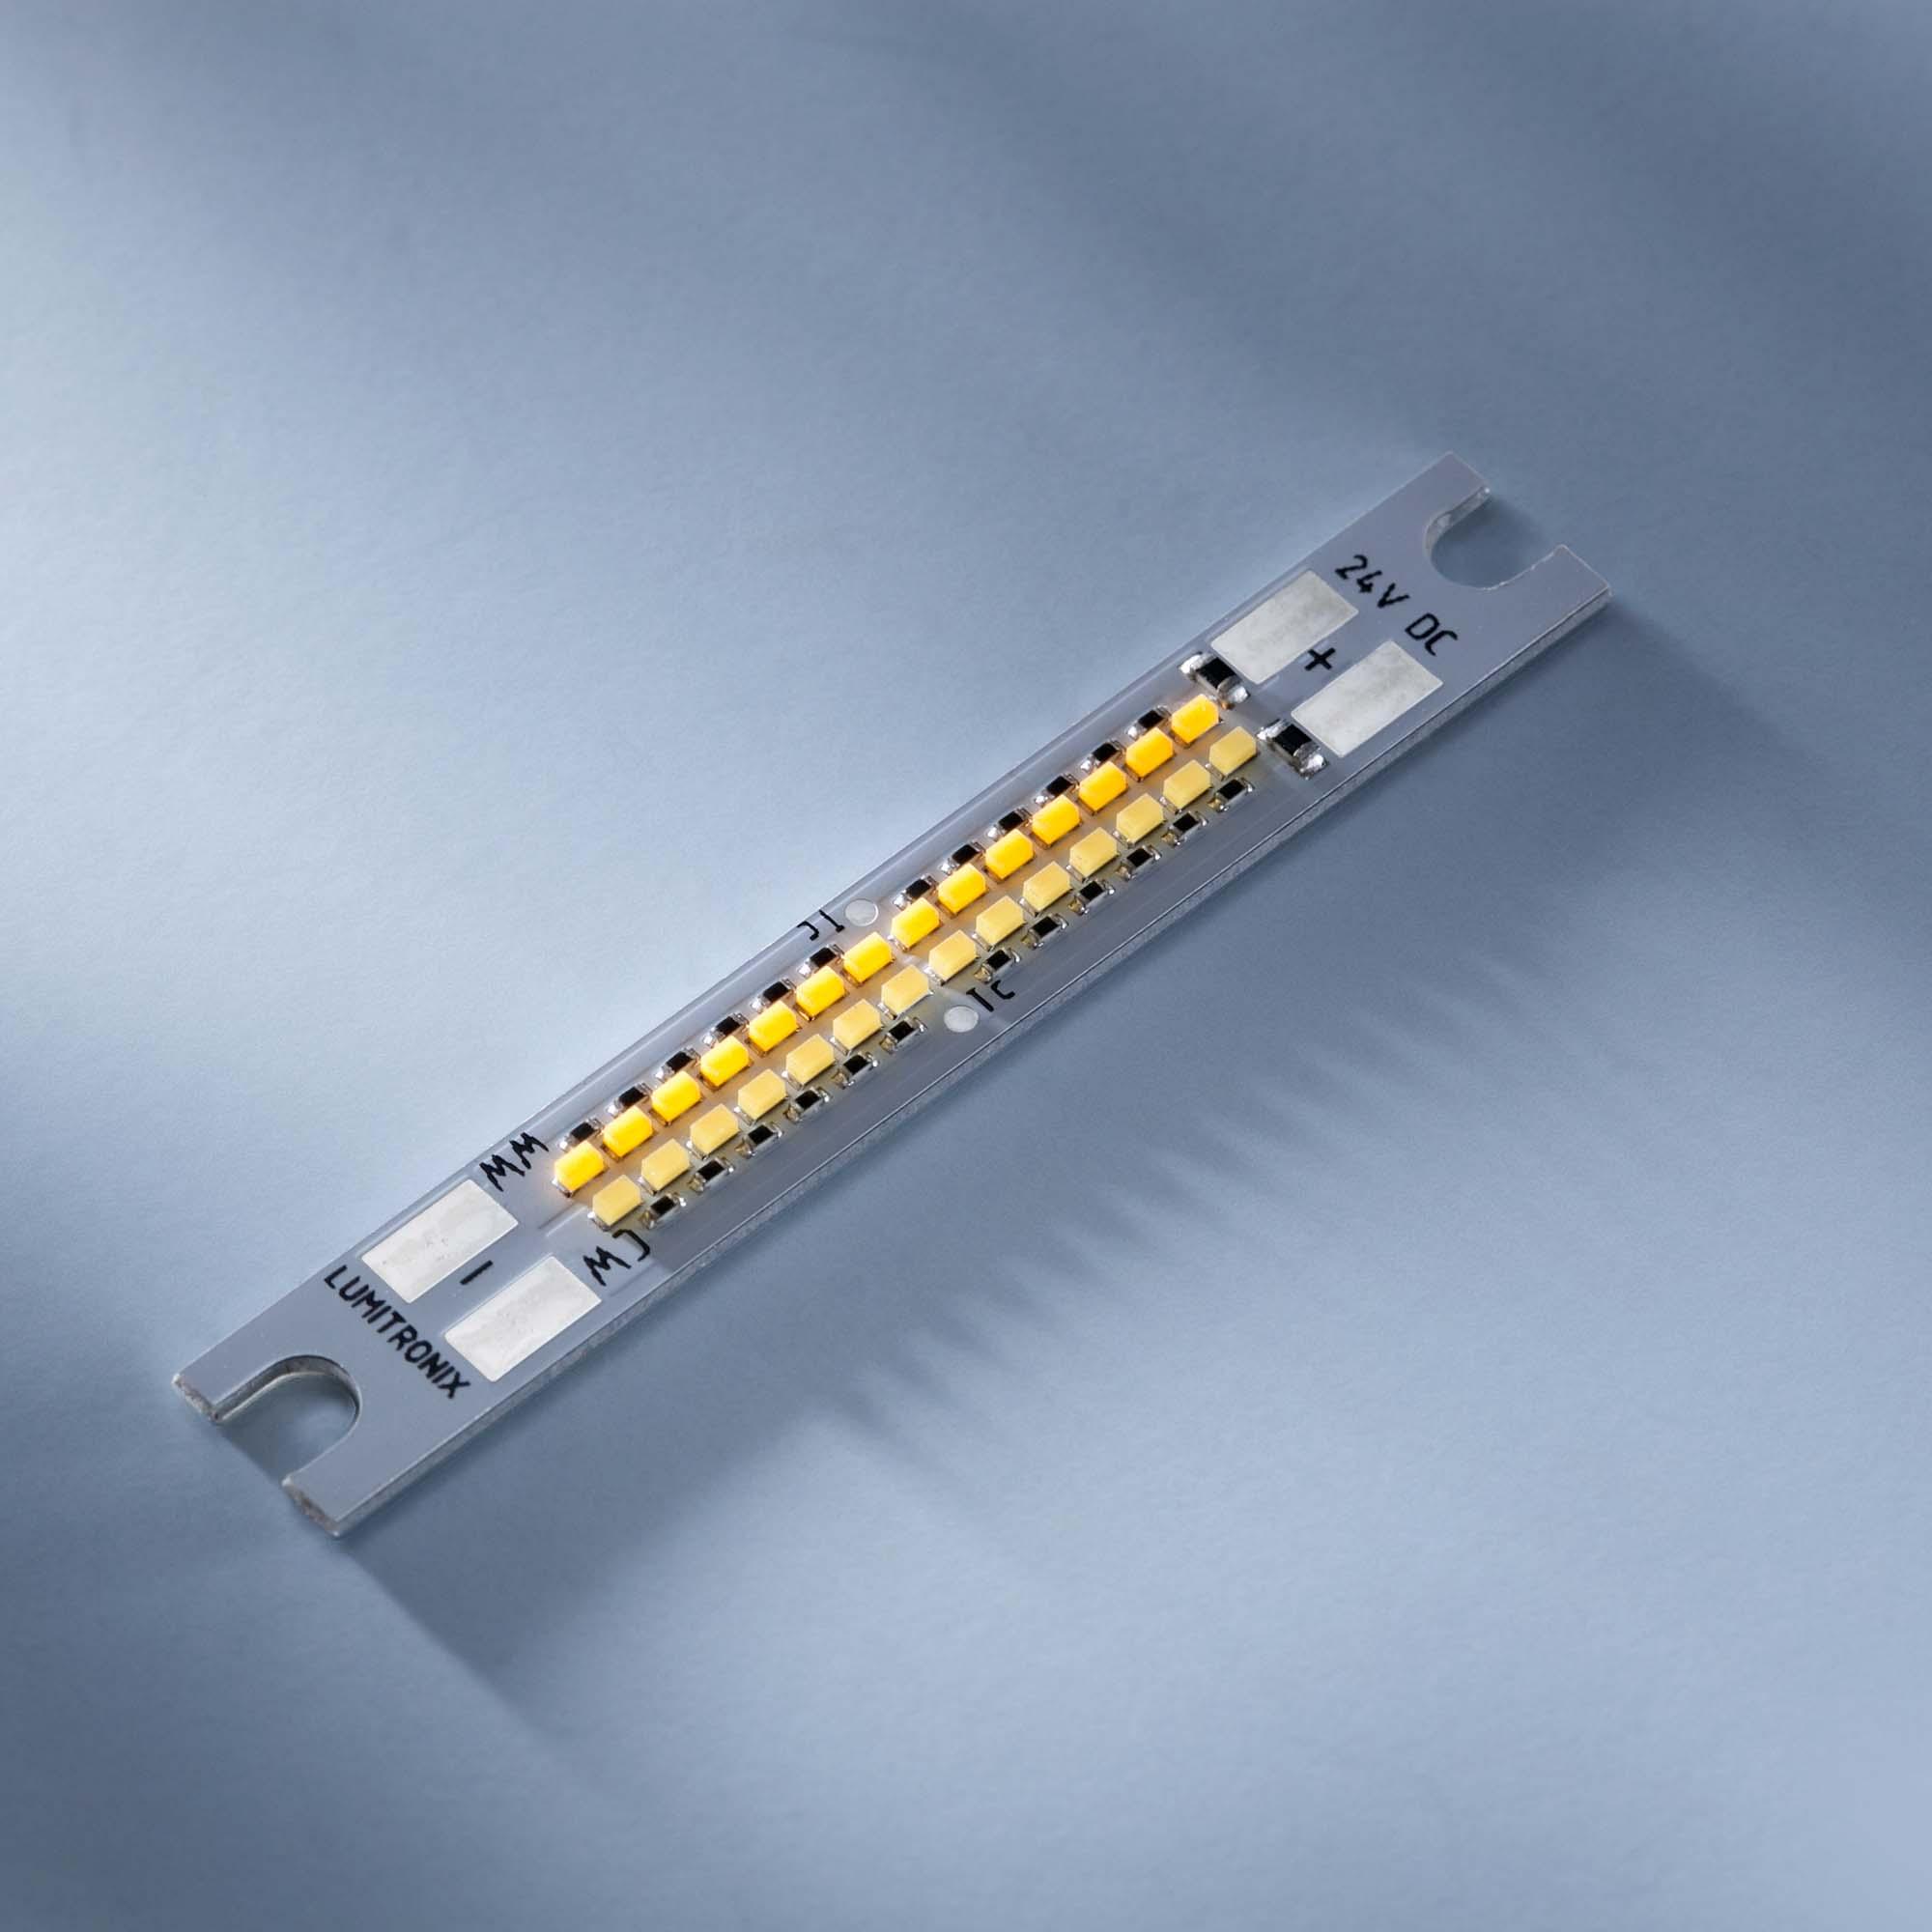 LUMITRONIX SmartArray 24V TW, 2700K - 6500K, 390lm 53684